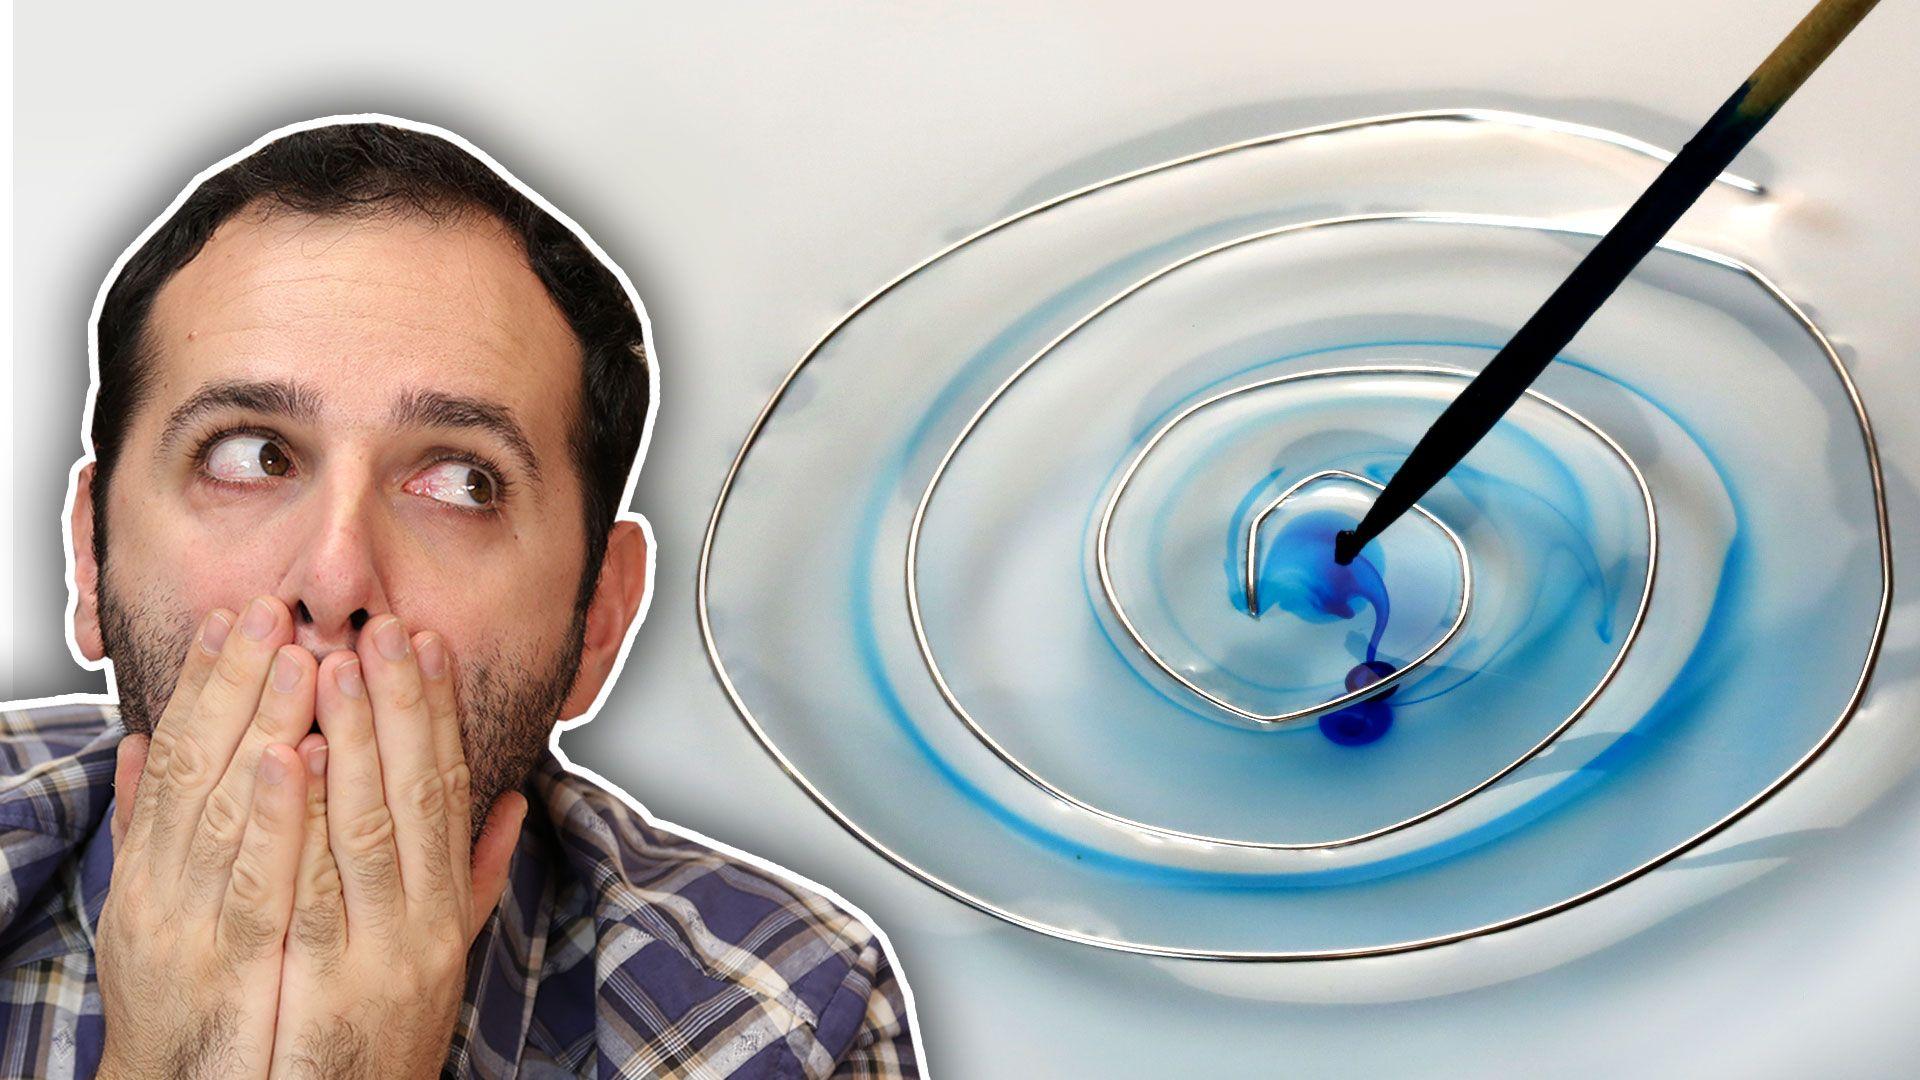 Experiencia Do Toque Magico Ultramegafacil Experimentos